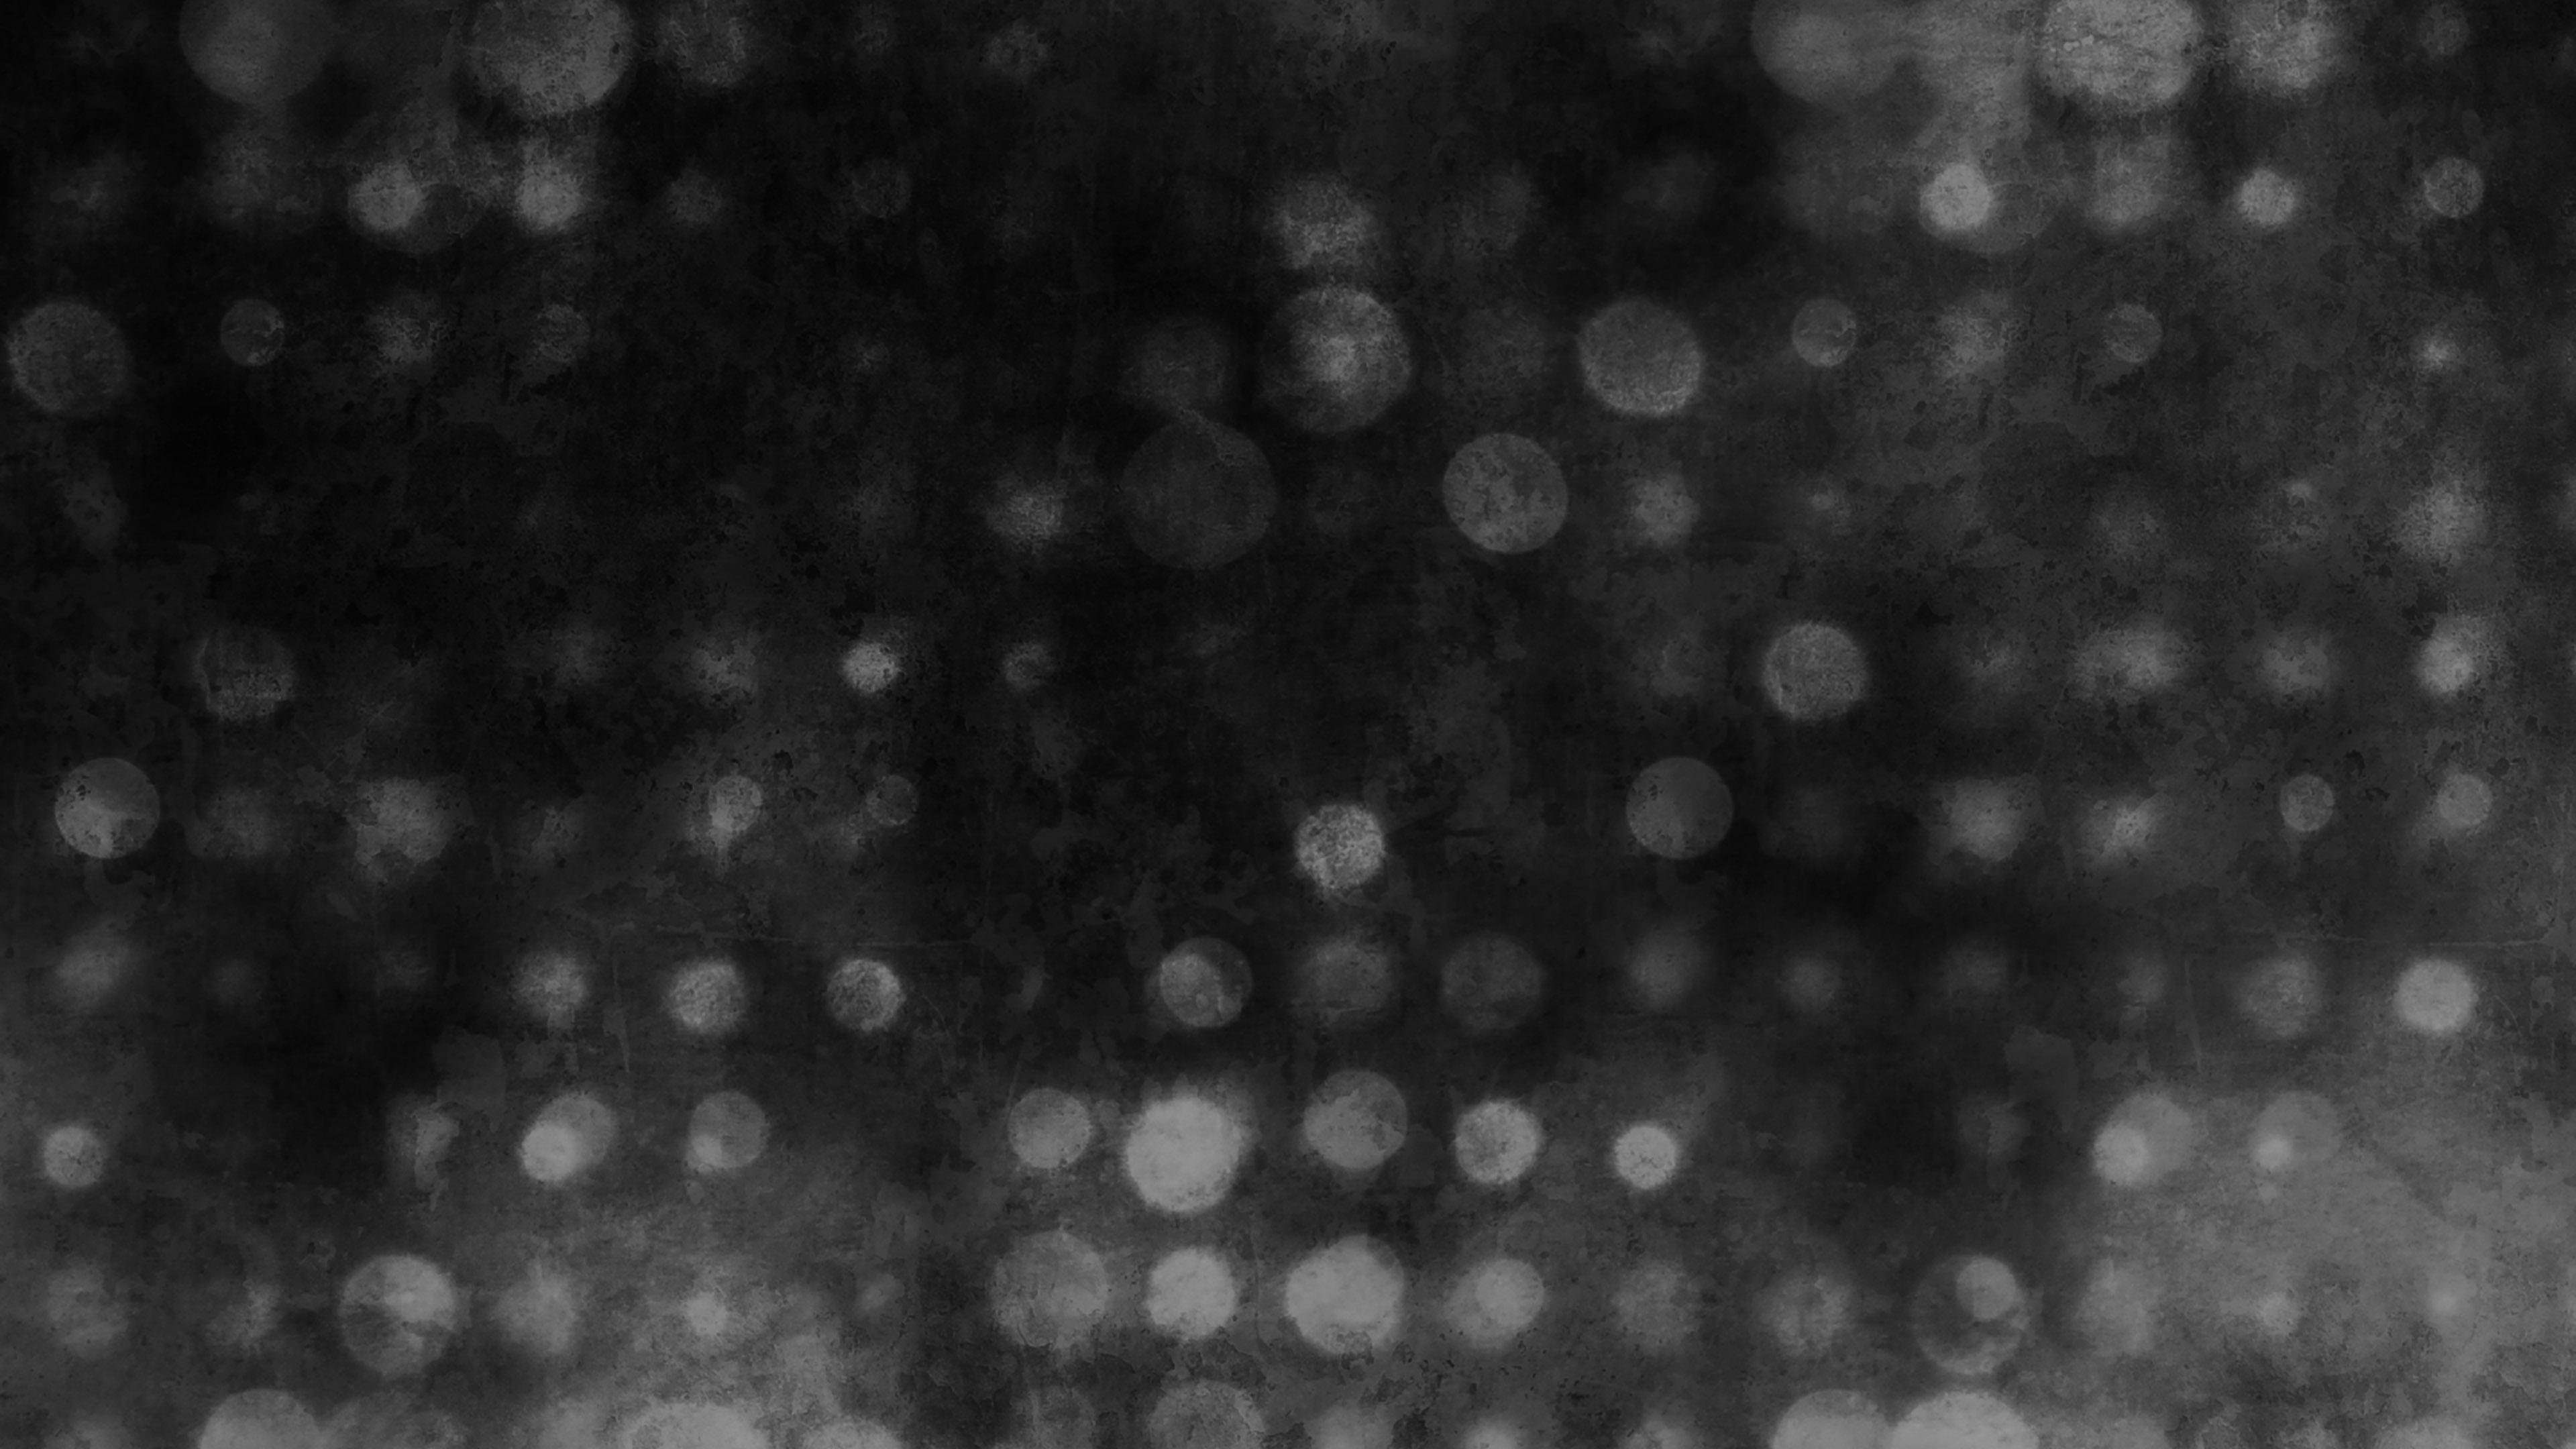 Dark Vintage Desktop Backgrounds - HD Wallpaper